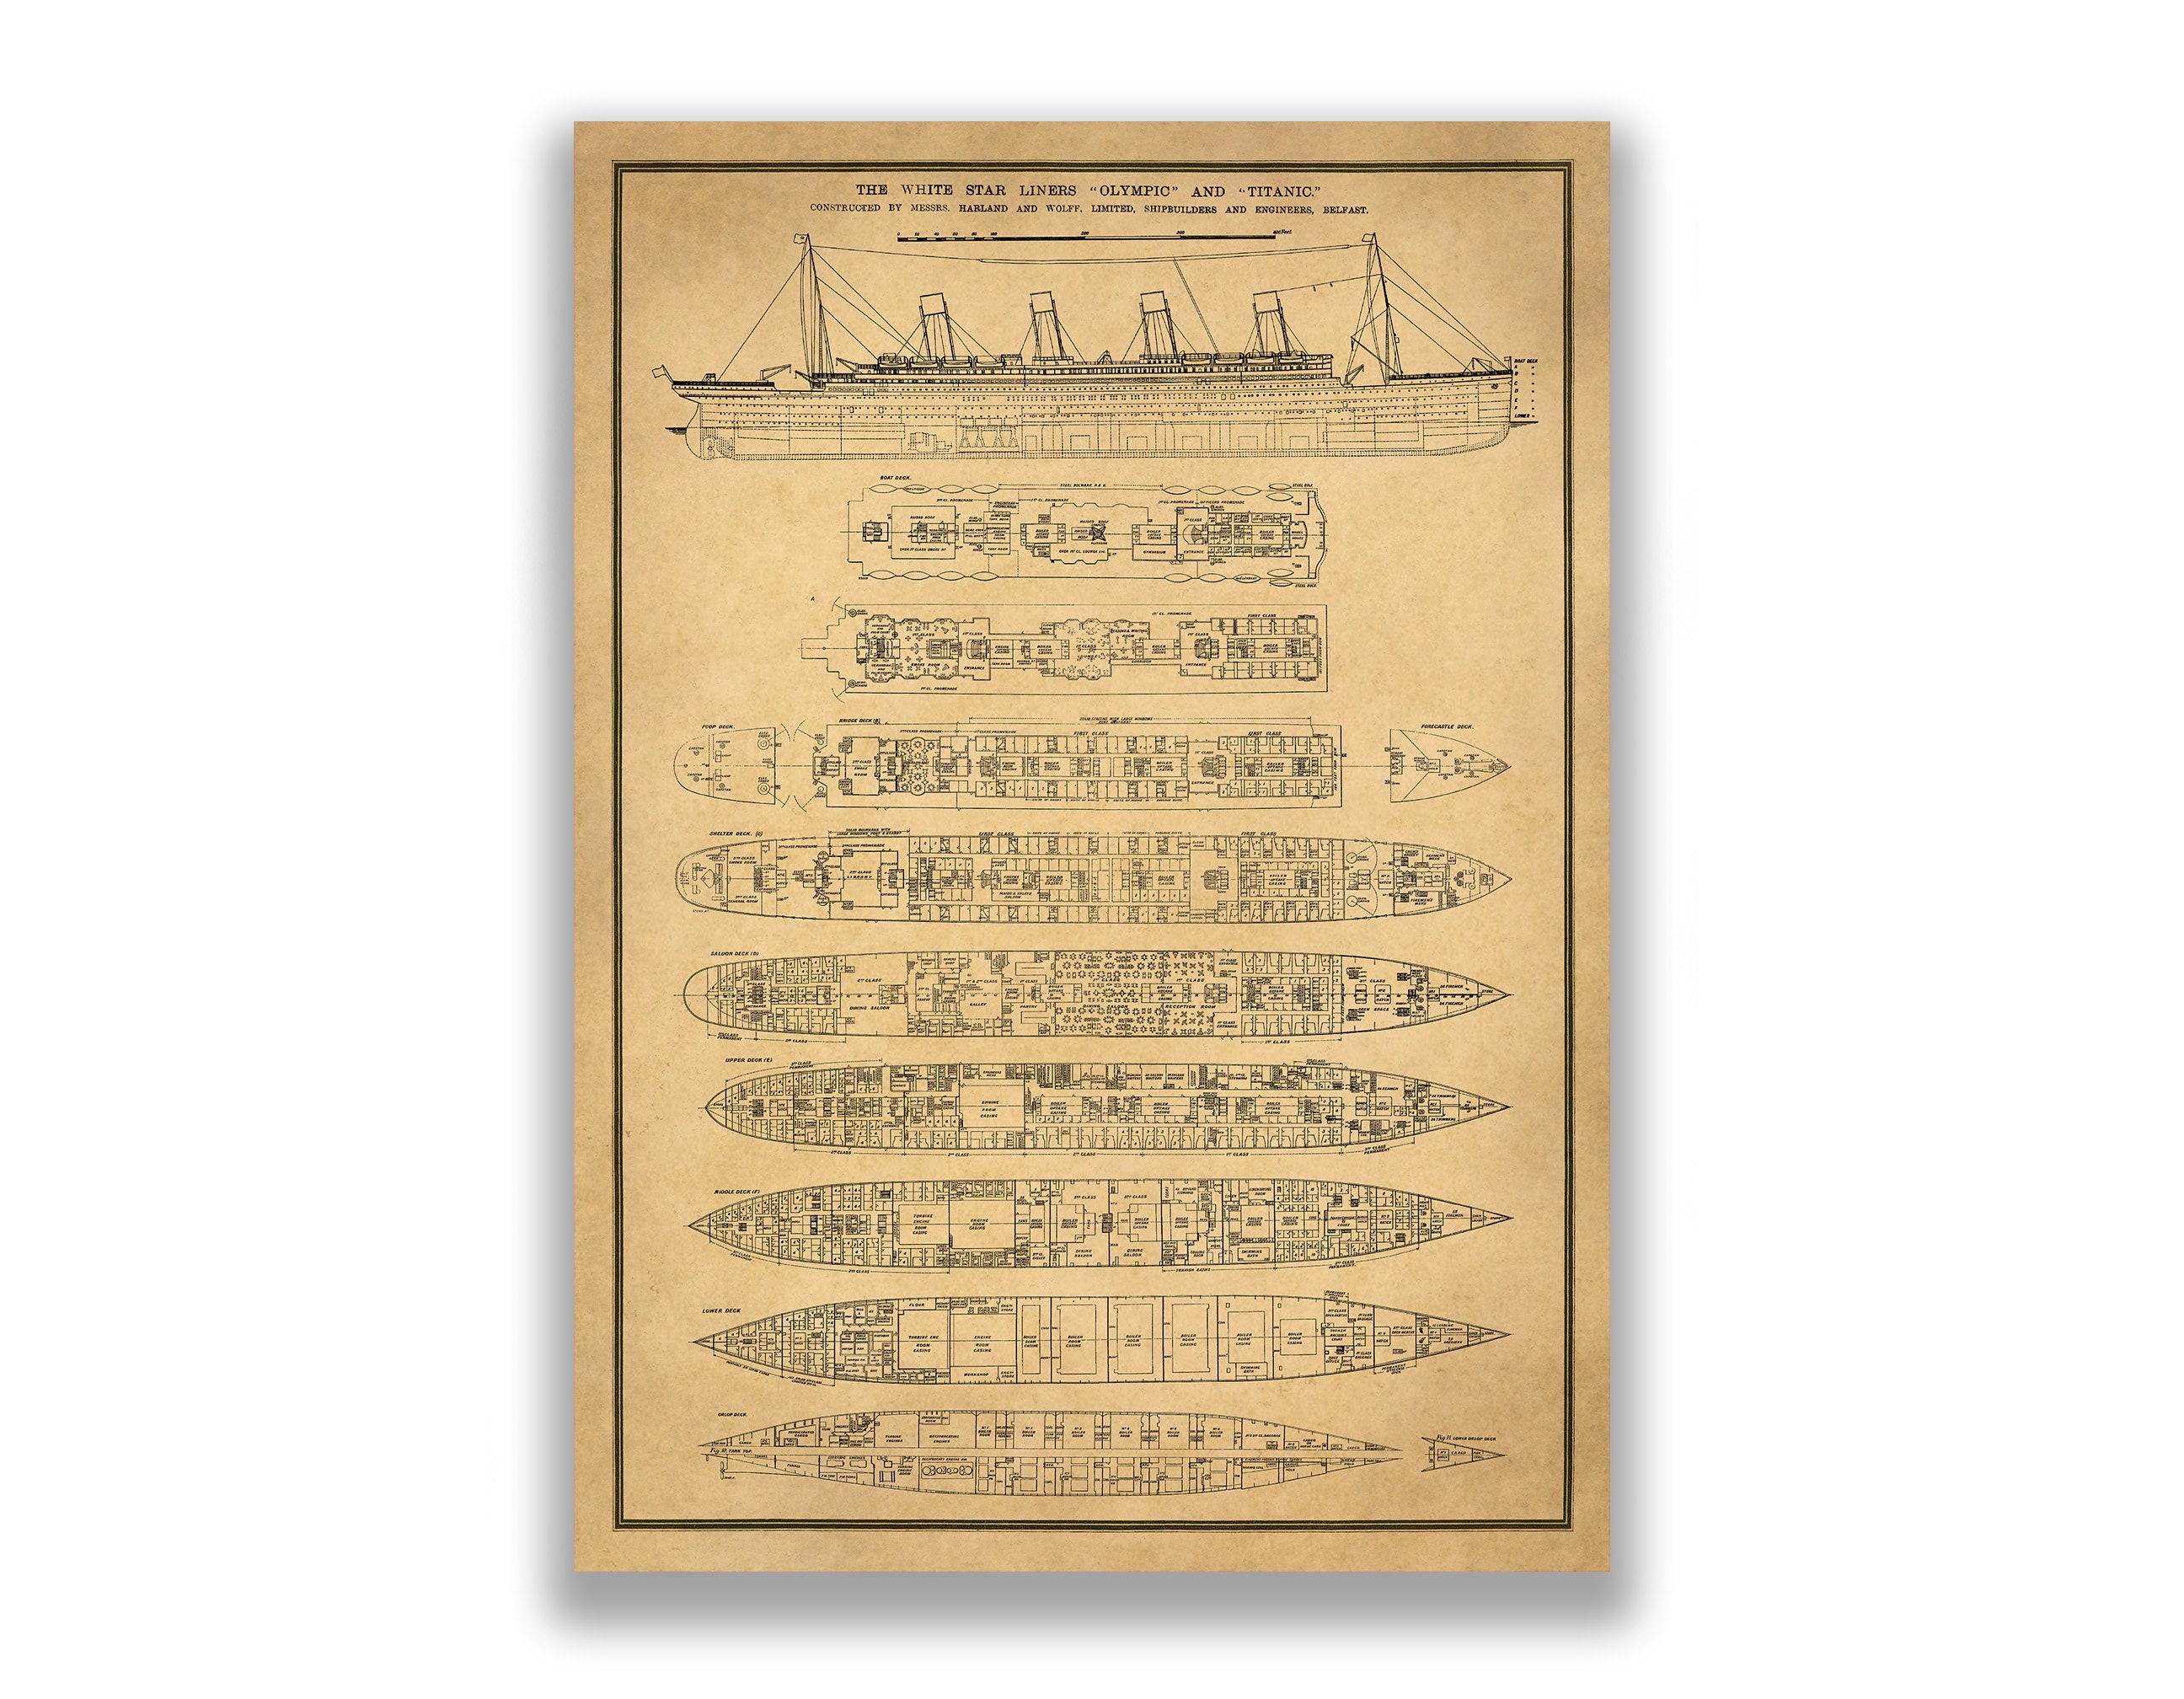 40x56 Max. Titanic Plan Wall Art, 2 finish options: print or gallery ...